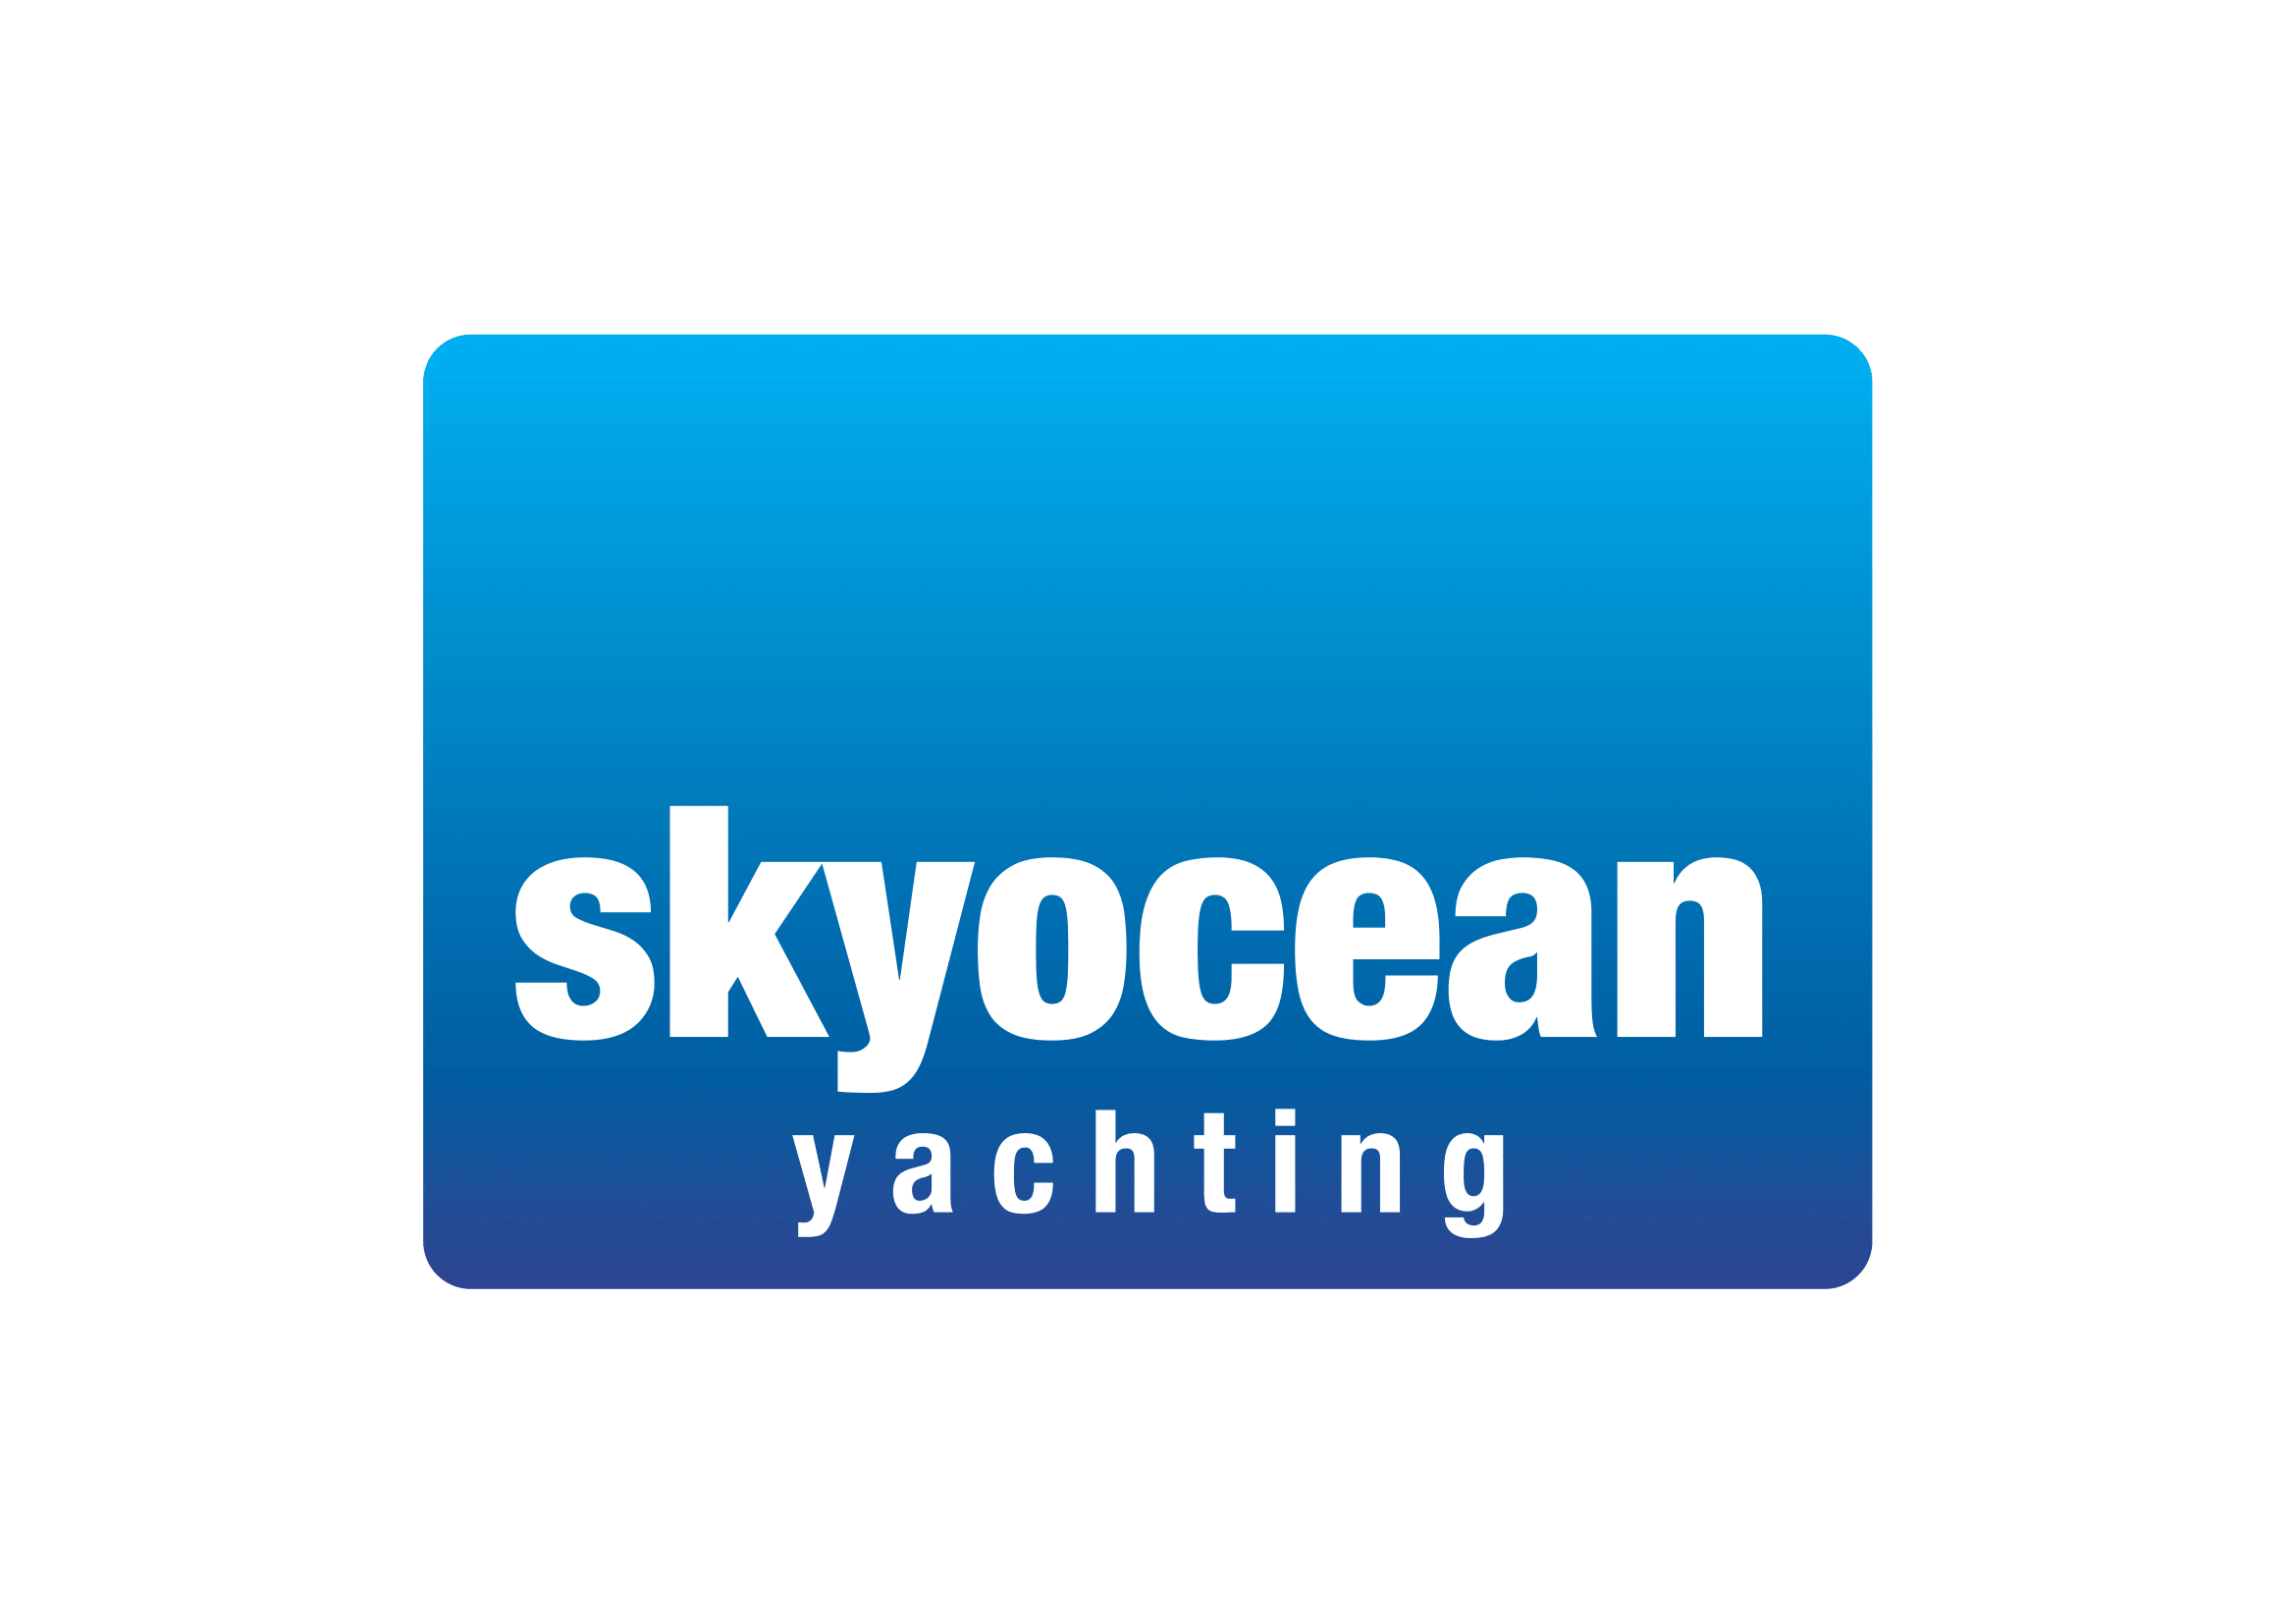 sky ocean yachting